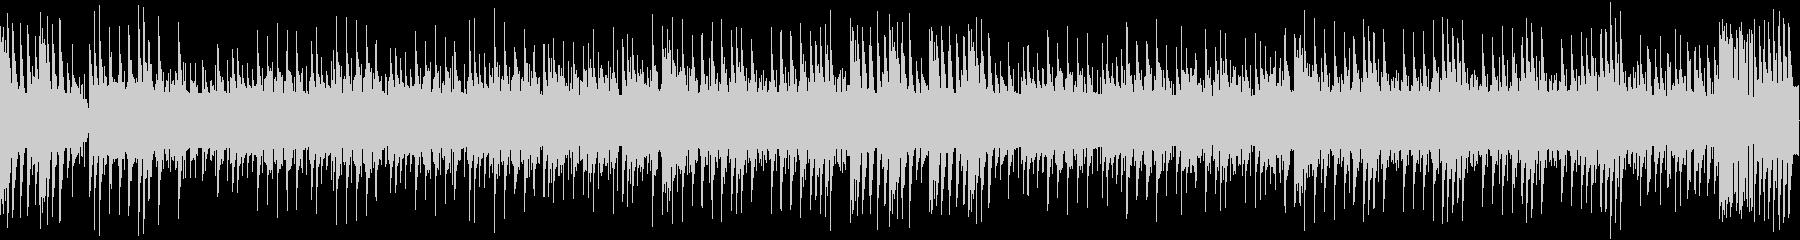 8bit ファンタジーなチップチューンの未再生の波形